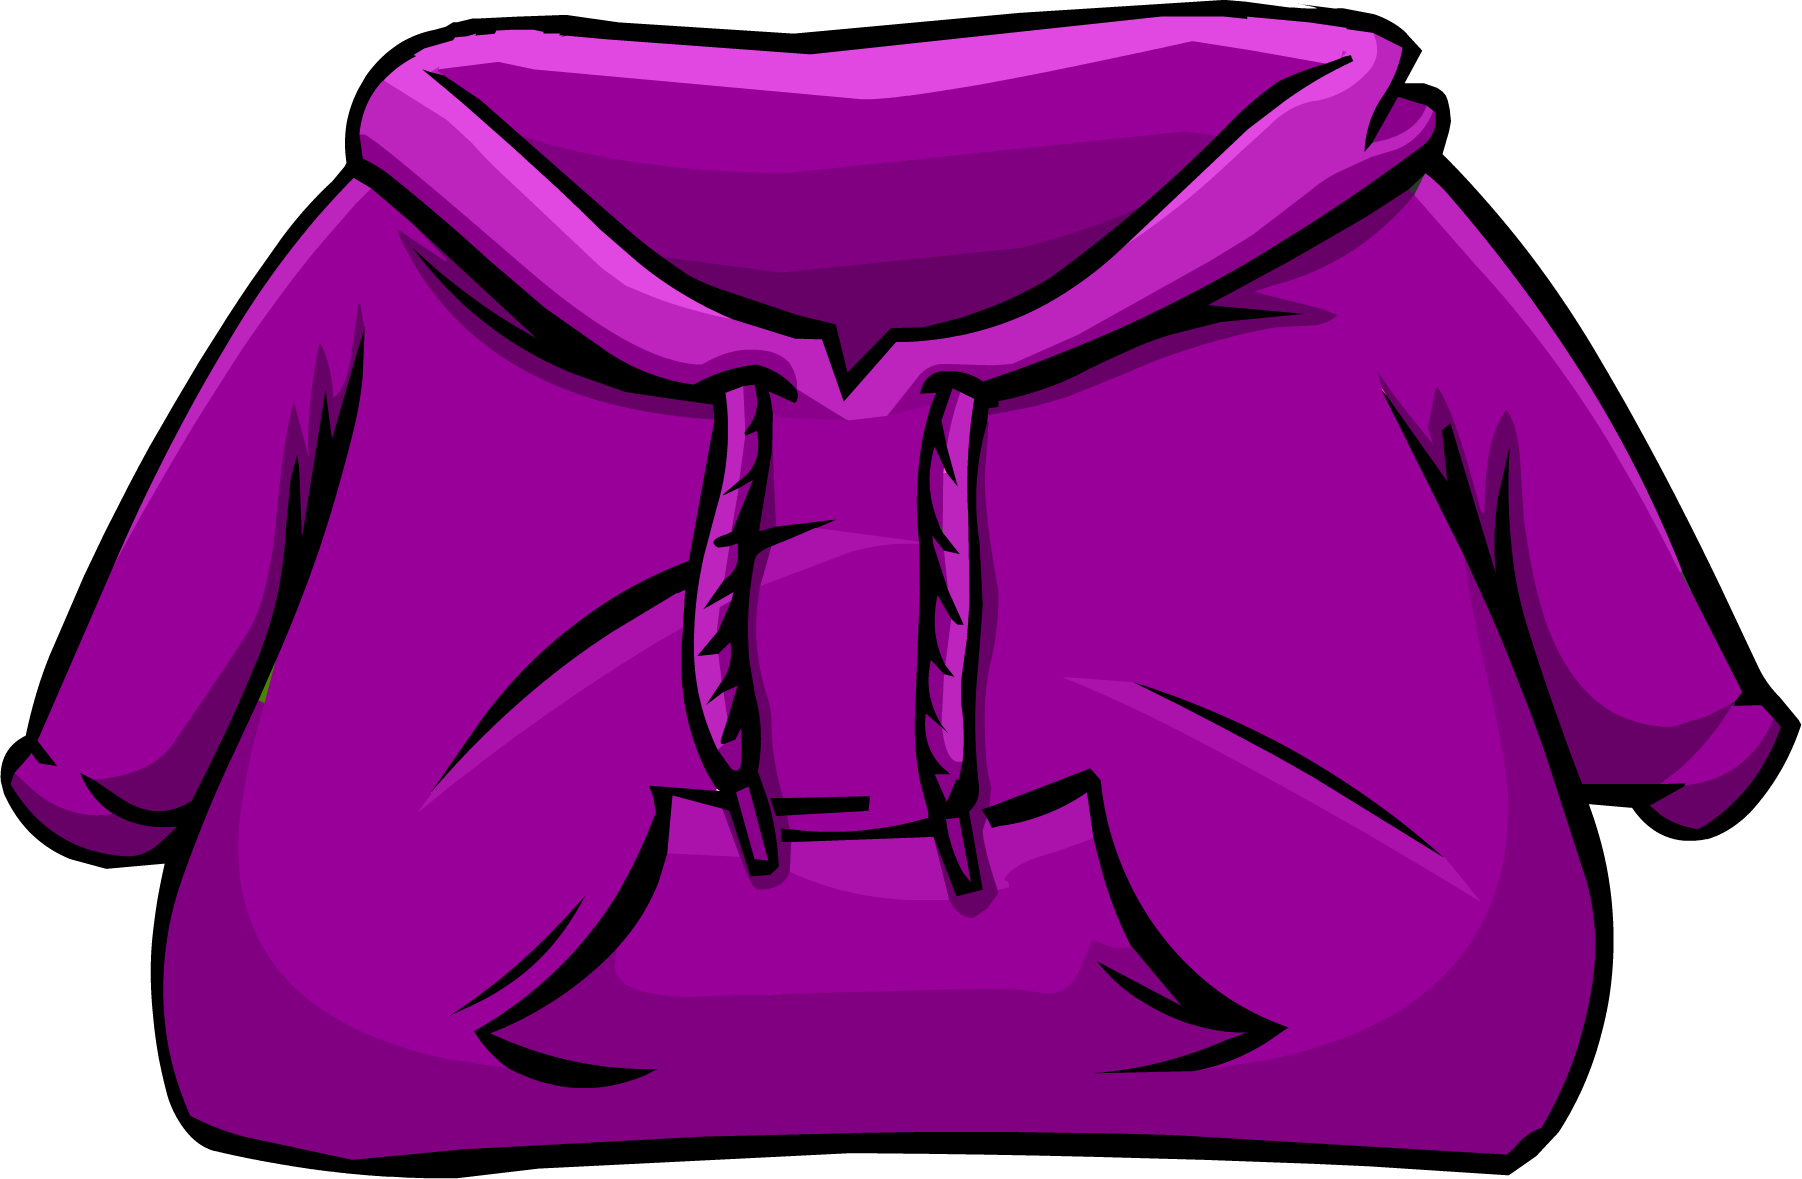 Hoodie clipart transparent. Purple club penguin wiki